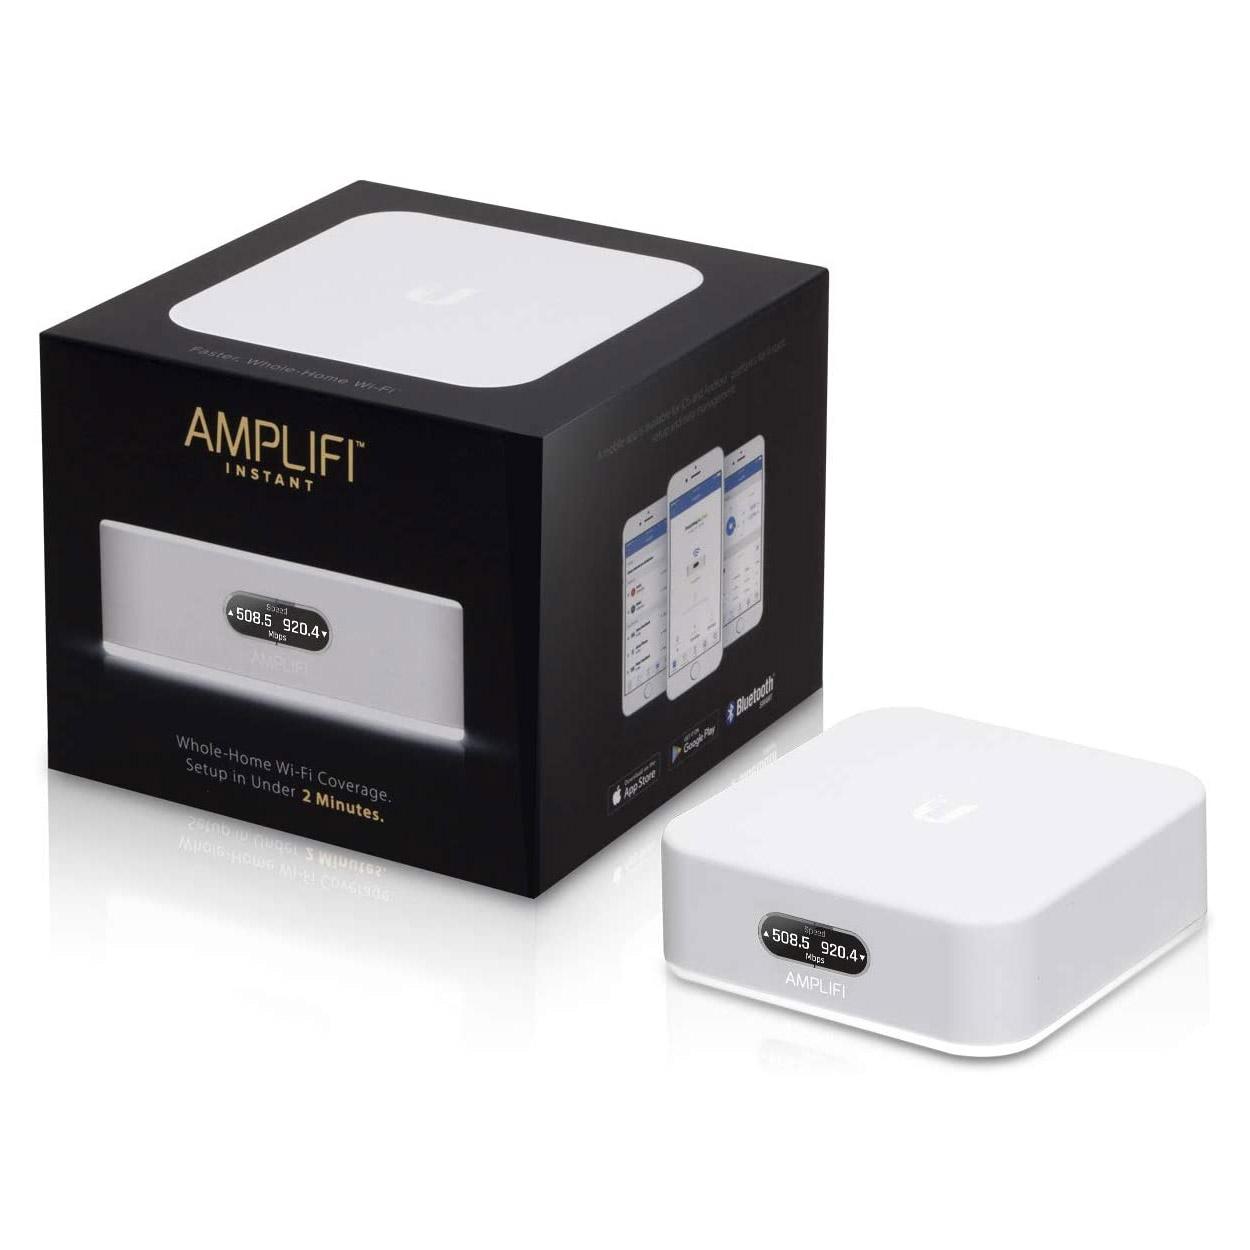 AmpliFi Instant Router - Embalagem